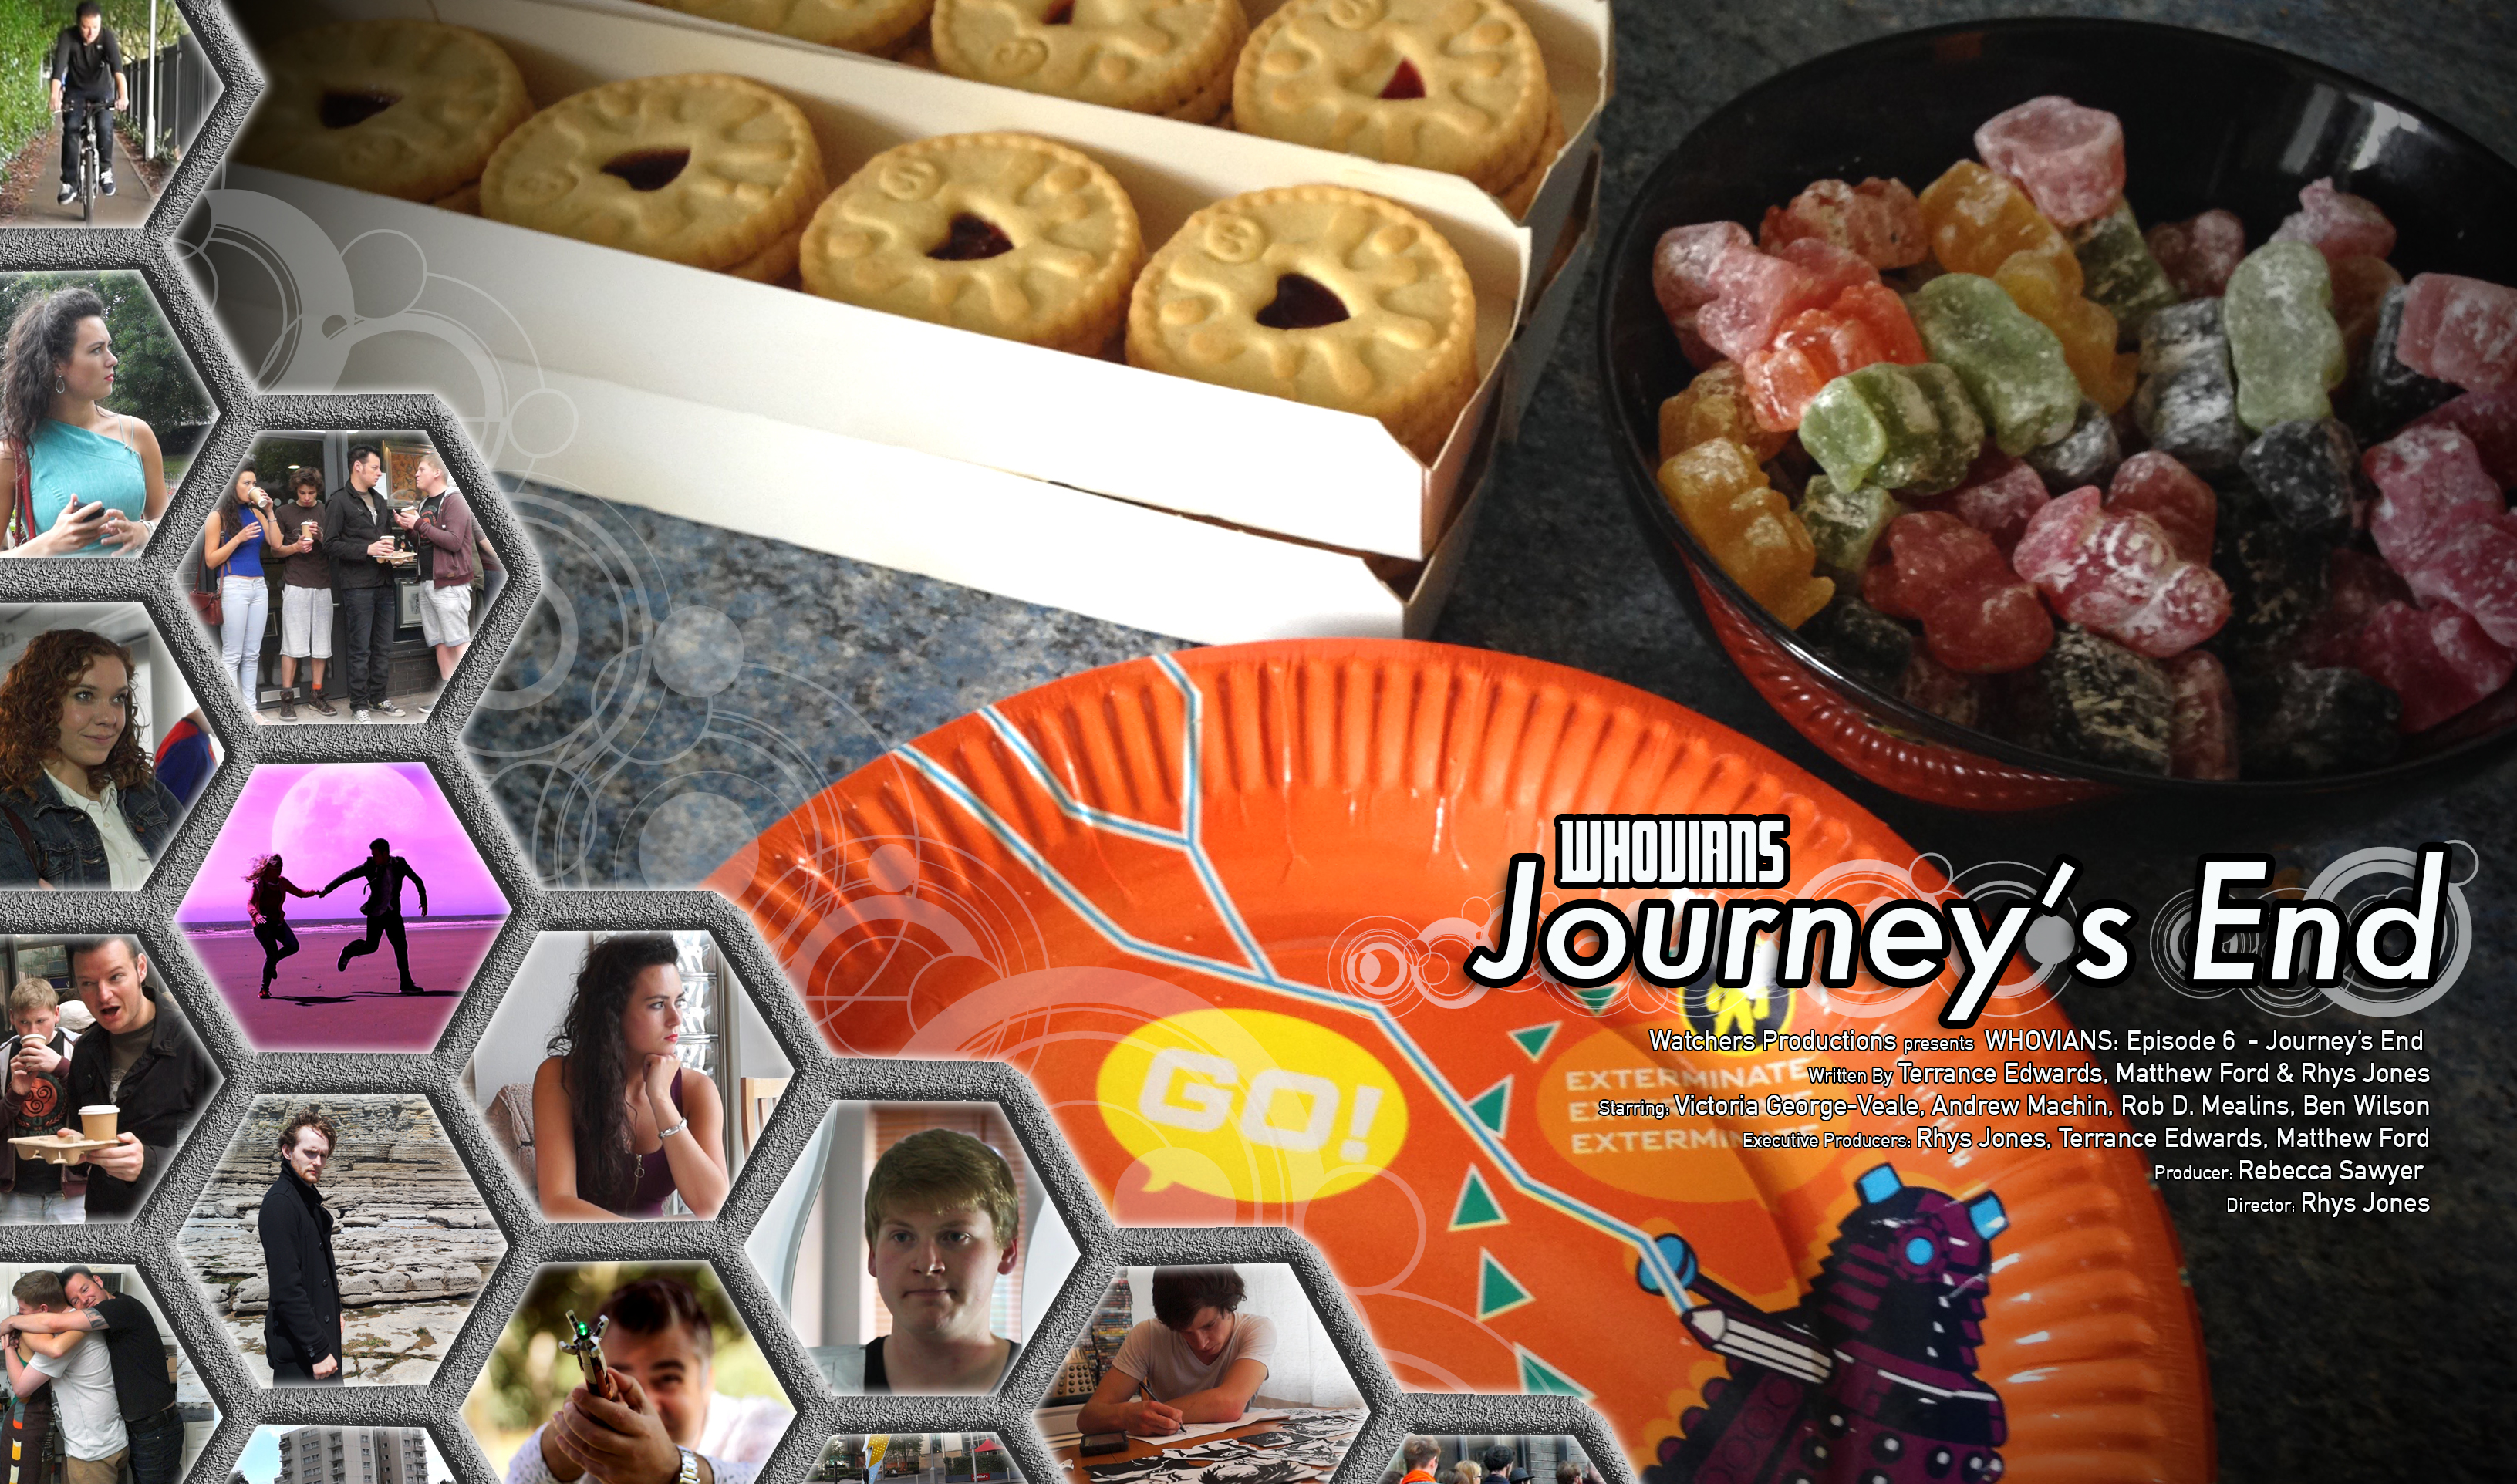 Episode 6 - Journey's End